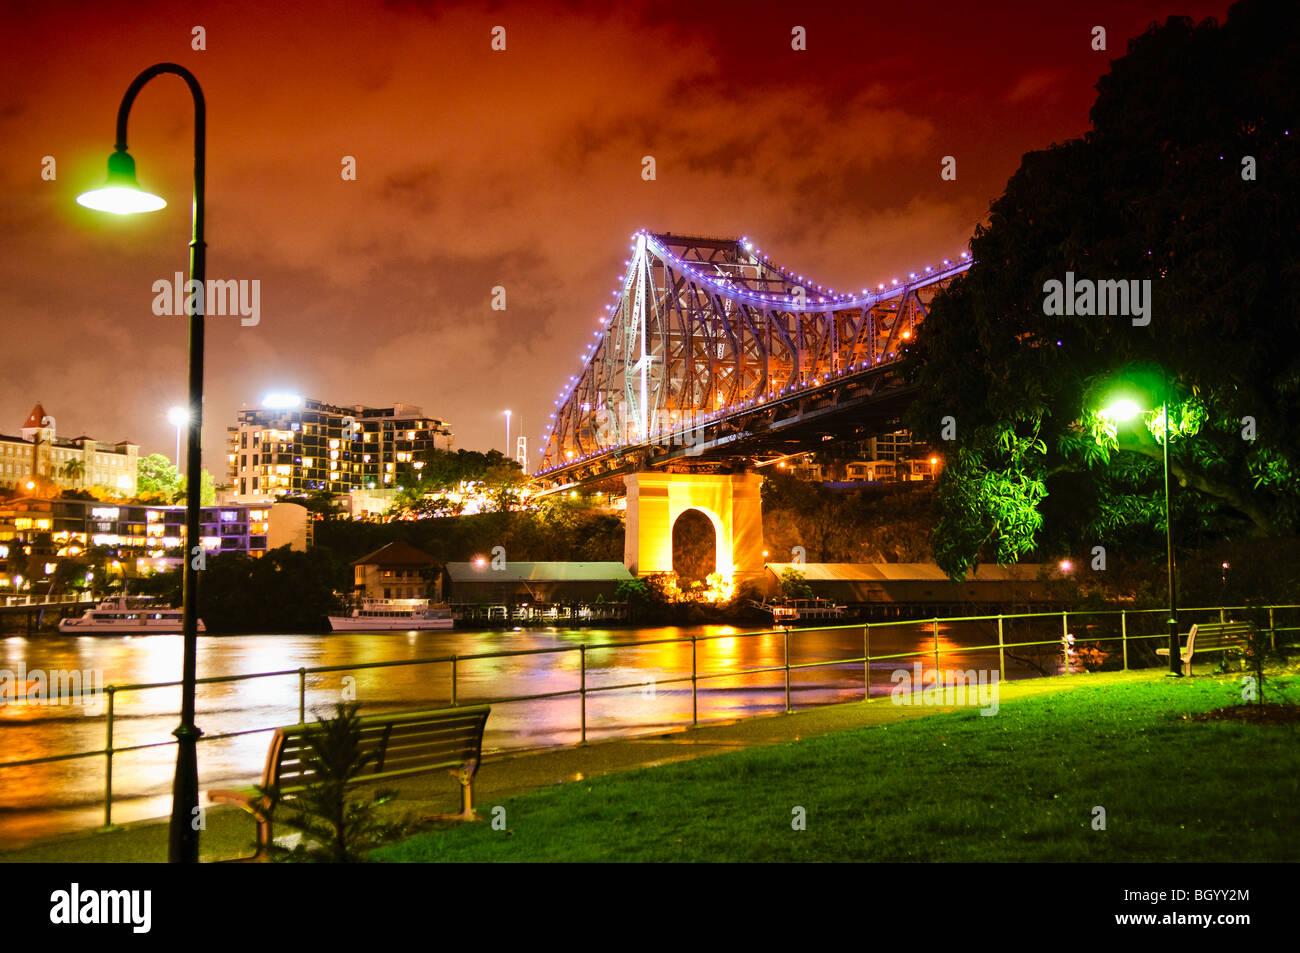 BRISBANE, Australia - Brisbane's Story Bridge at night - Stock Image